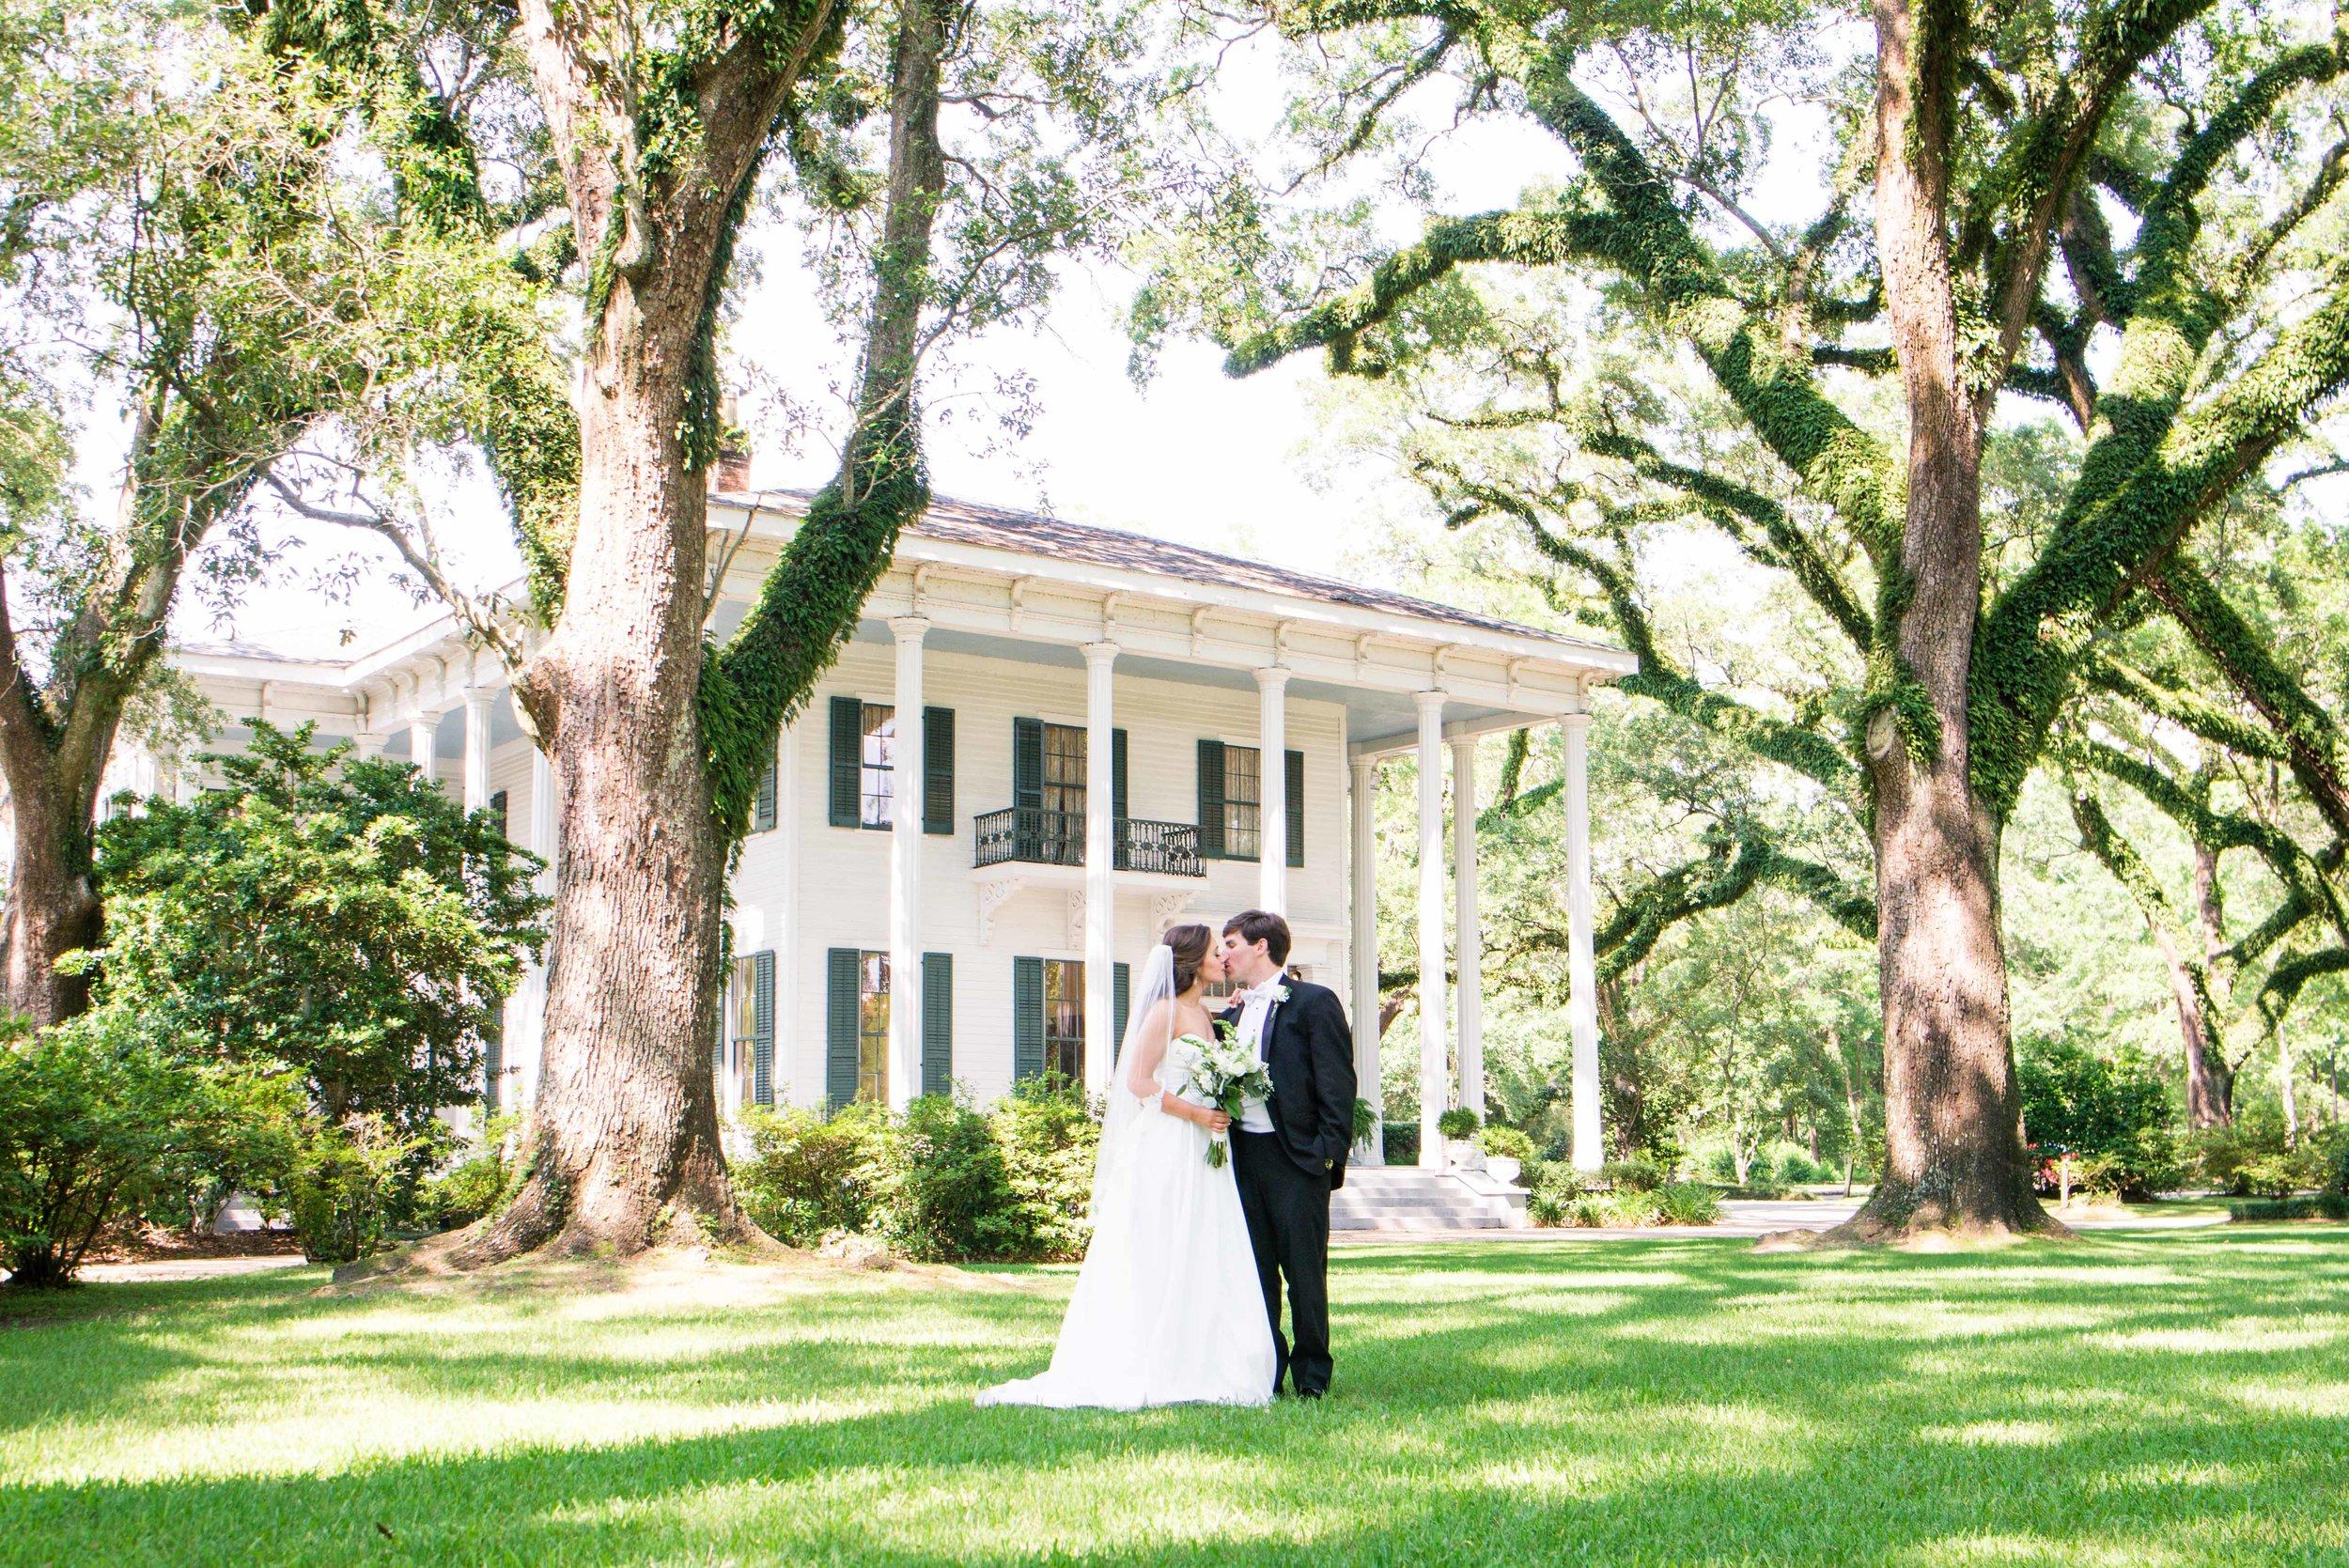 Bragg-Mitchell Mansion Mobile, Alabama Wedding Spring 2018 Christy & Tyler